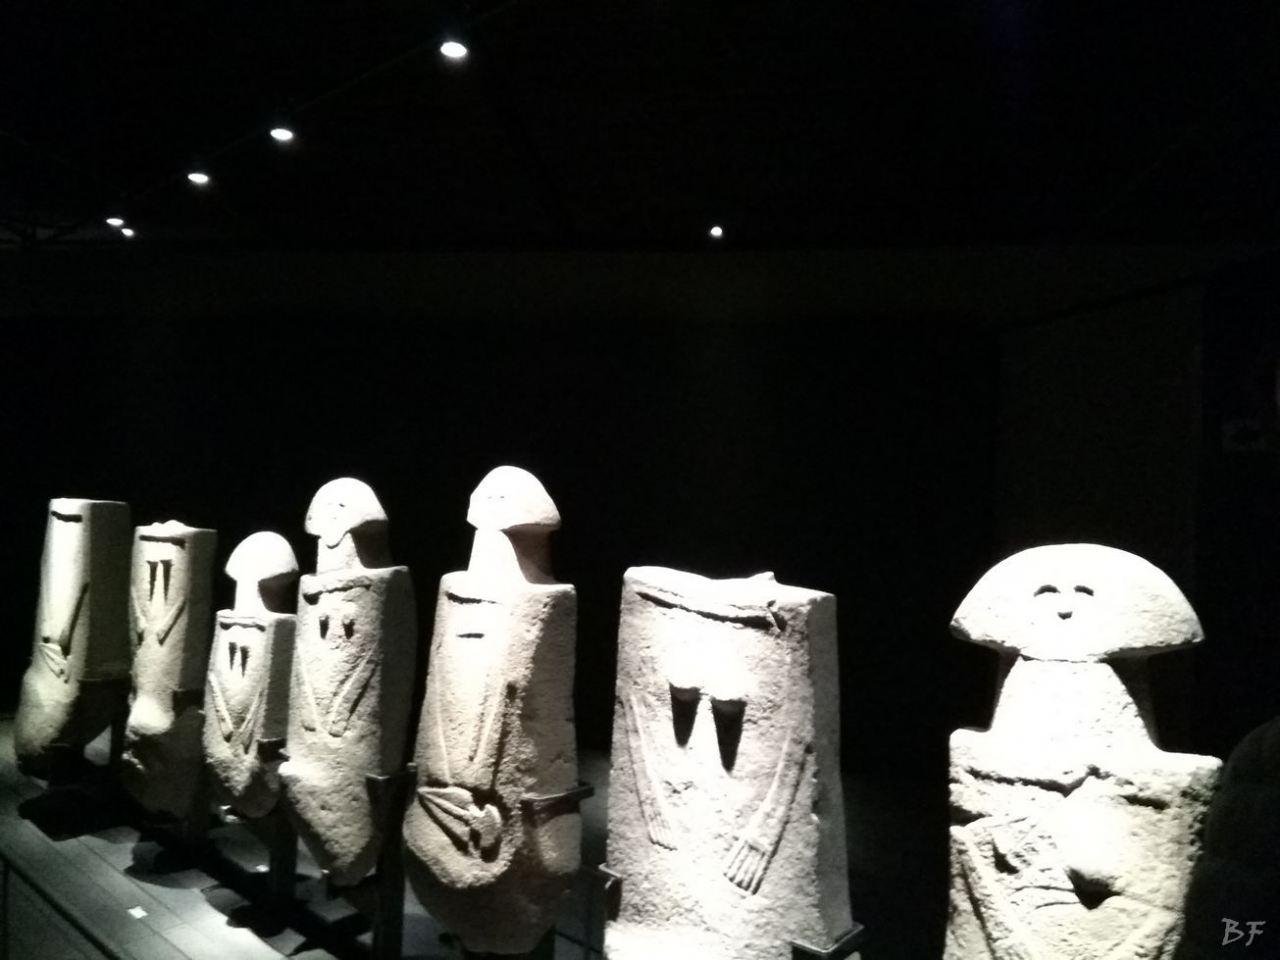 Statue-Stele-di-Pontremoli-Massa-Carrara-Lunigiana-Toscana-7